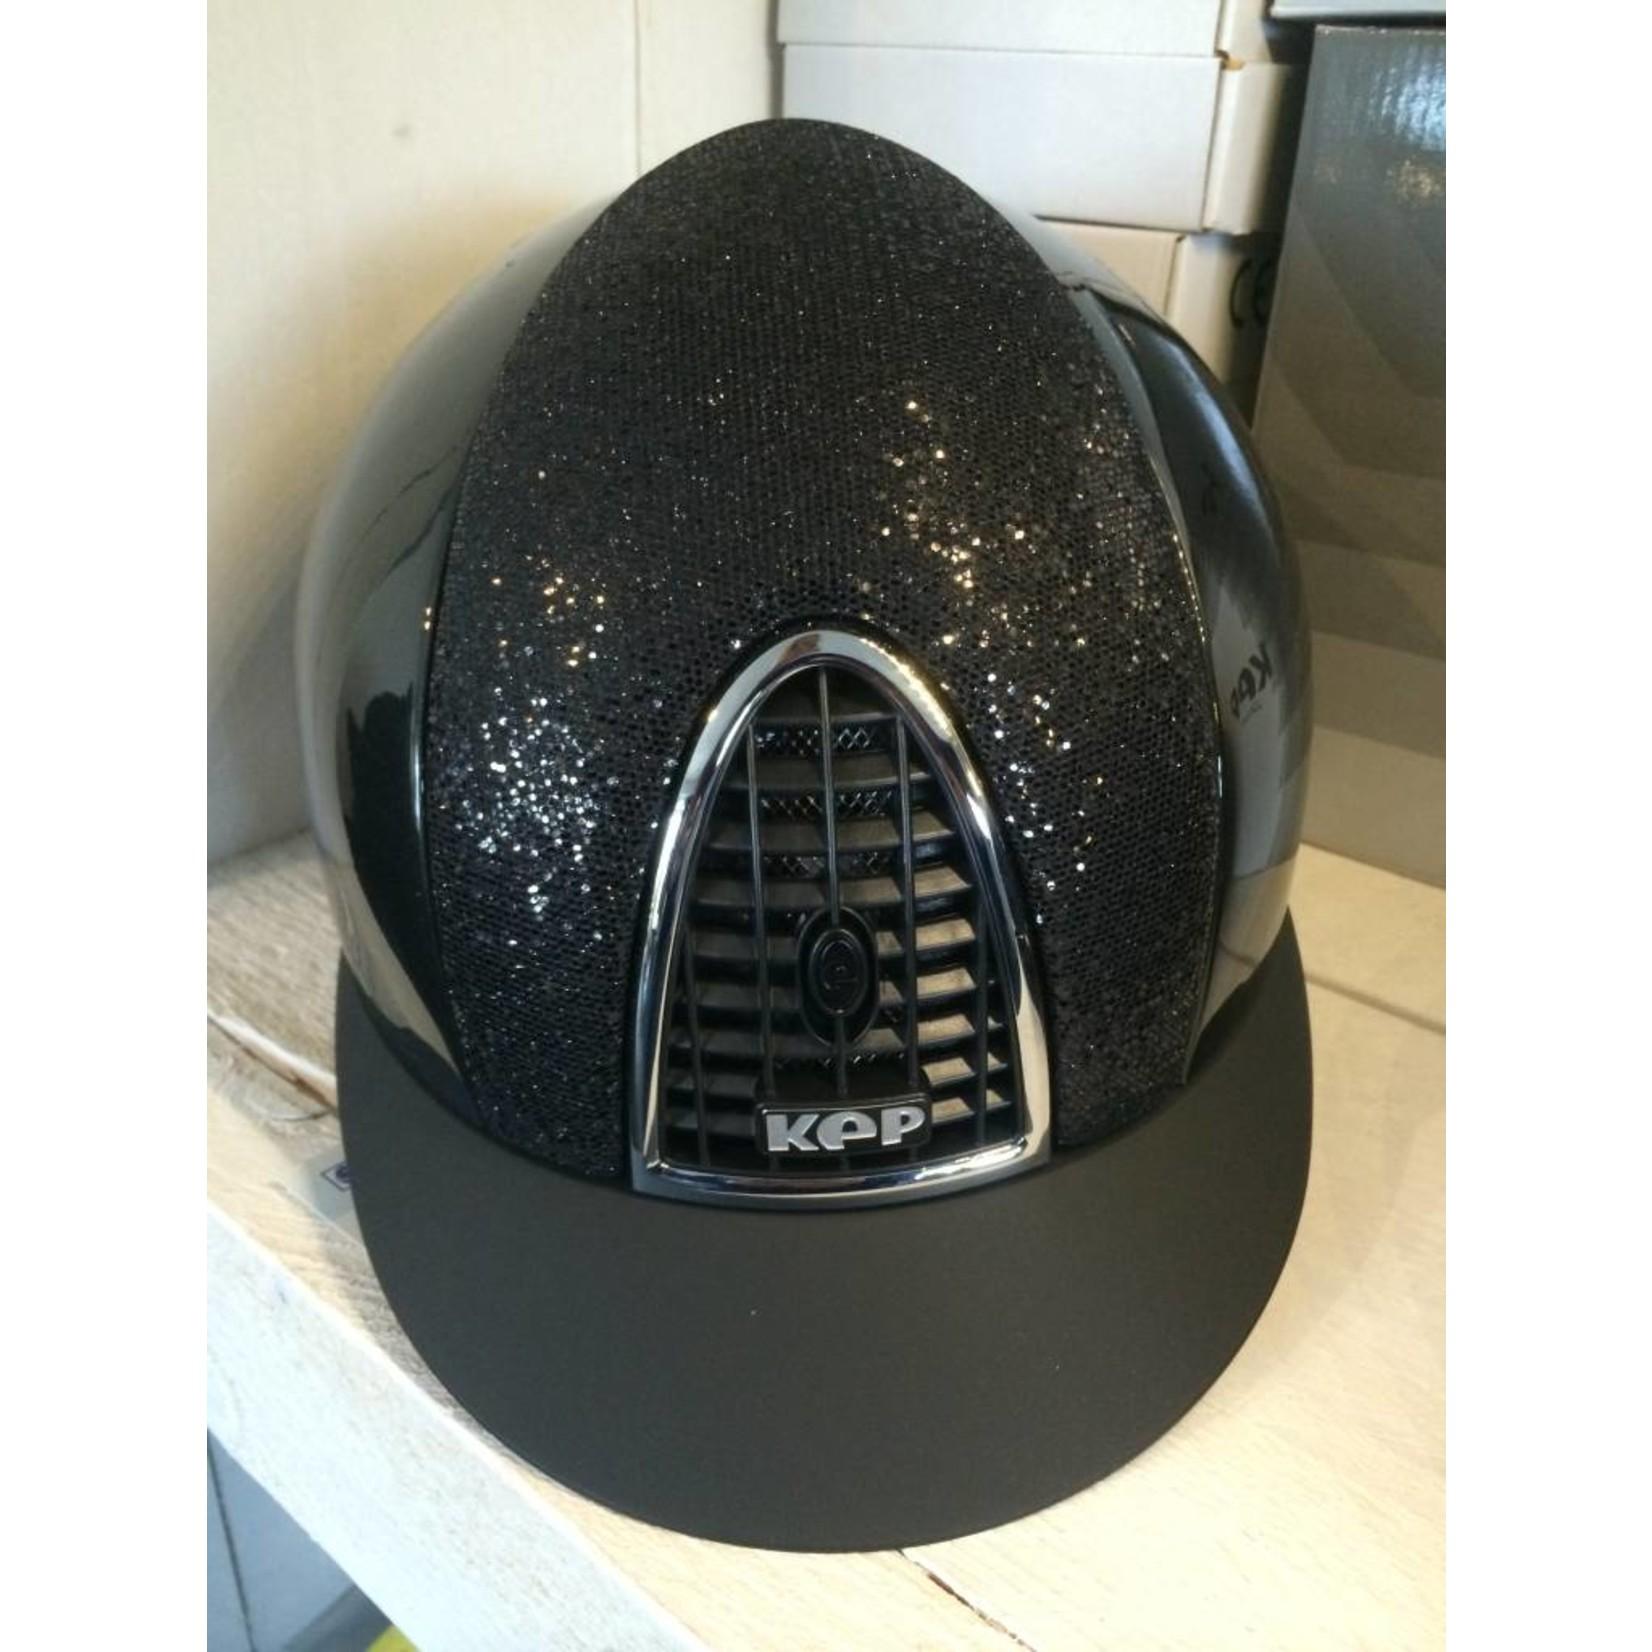 KEP Italia shine black with glitter front